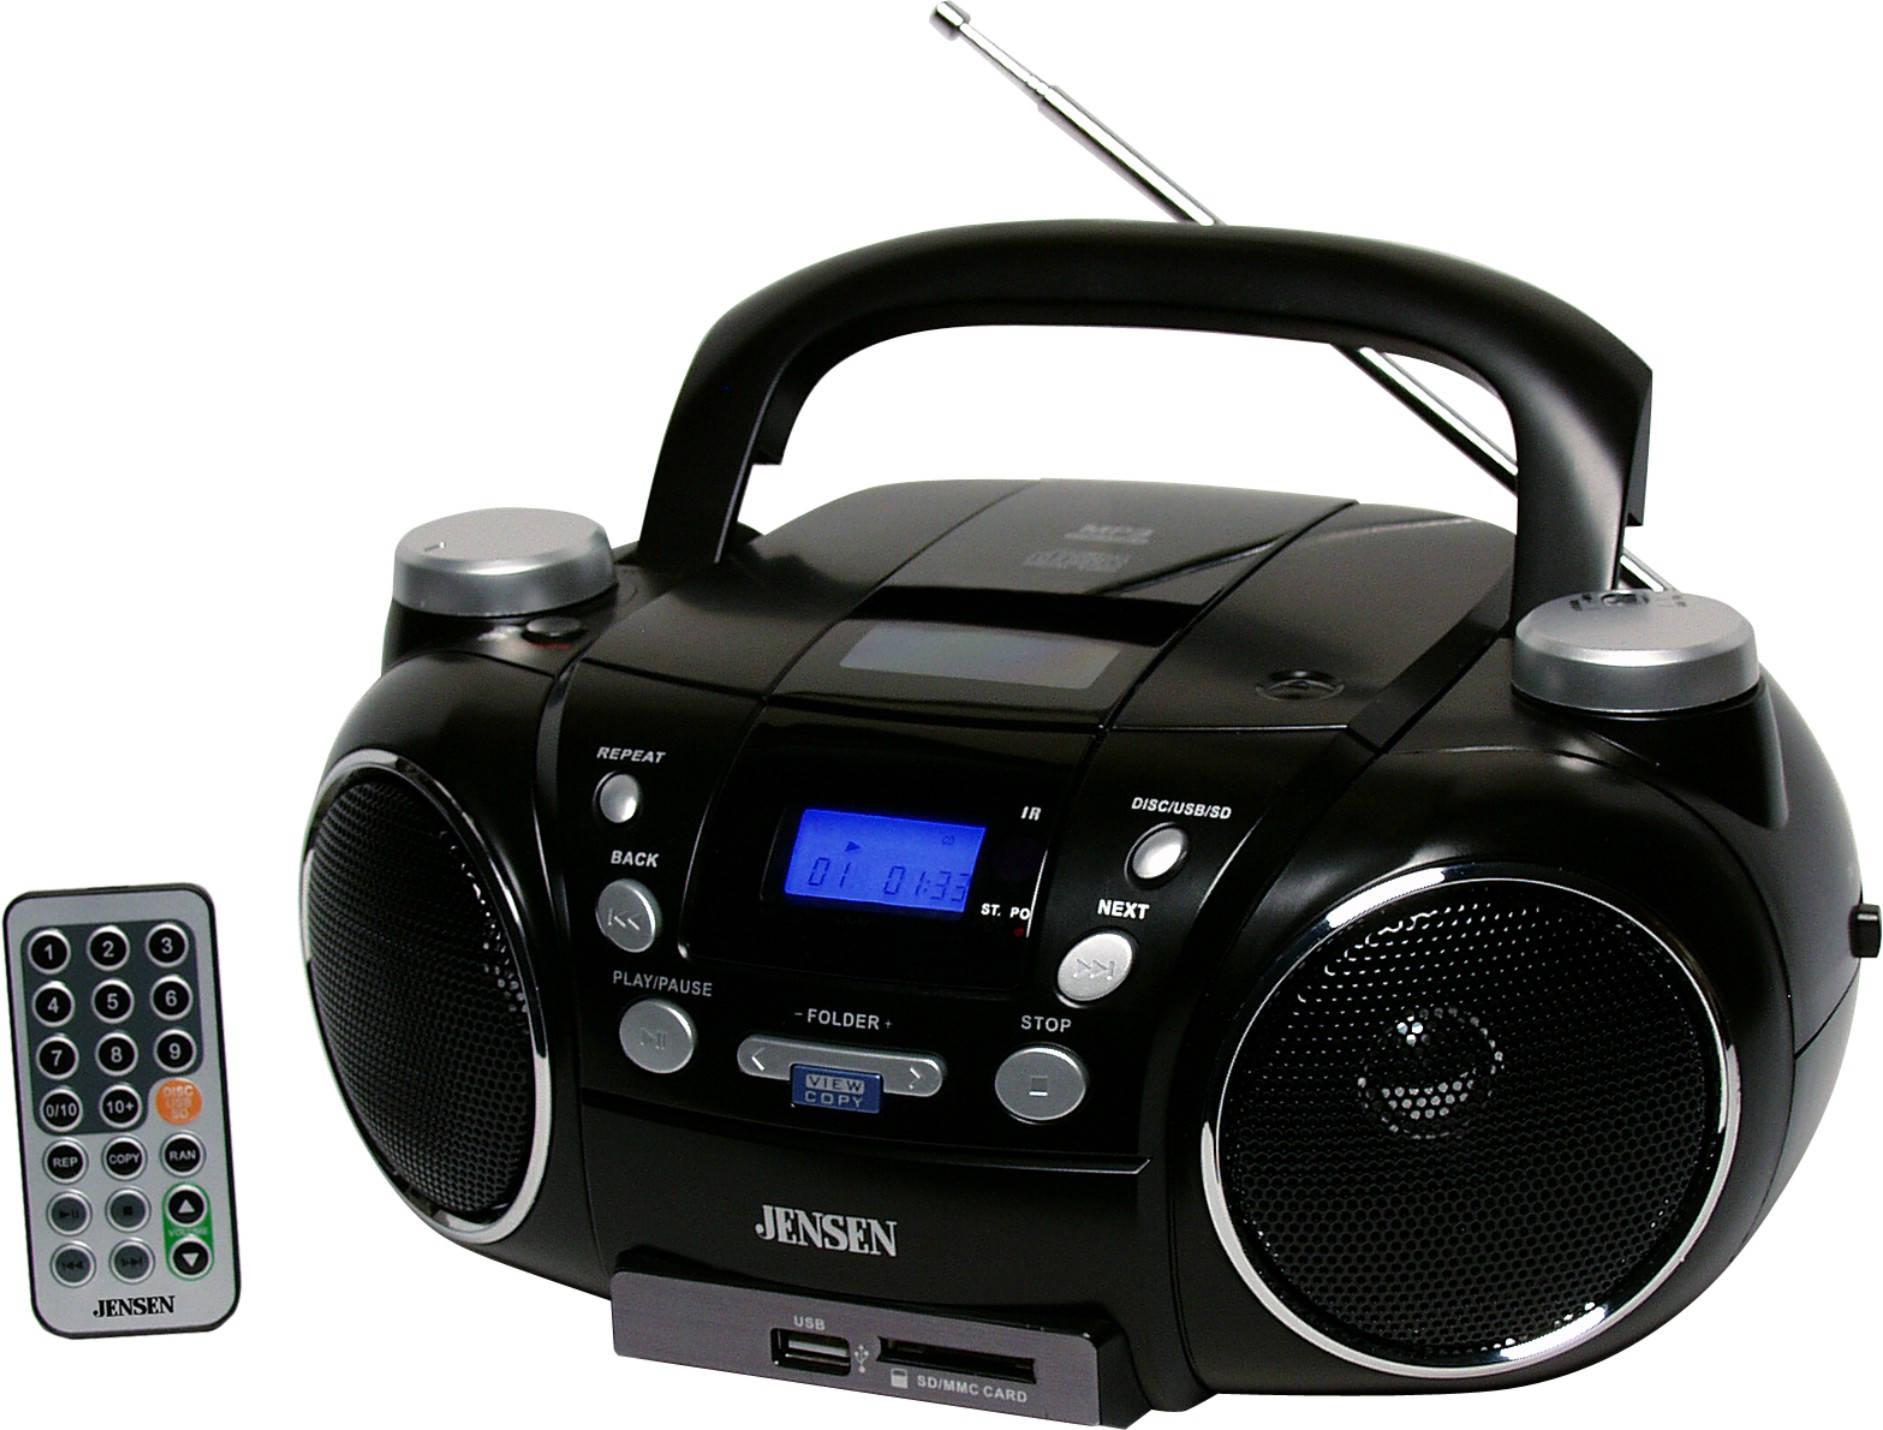 Jensen Cd750 Black Portable CD Player AM/FM Radio Digital